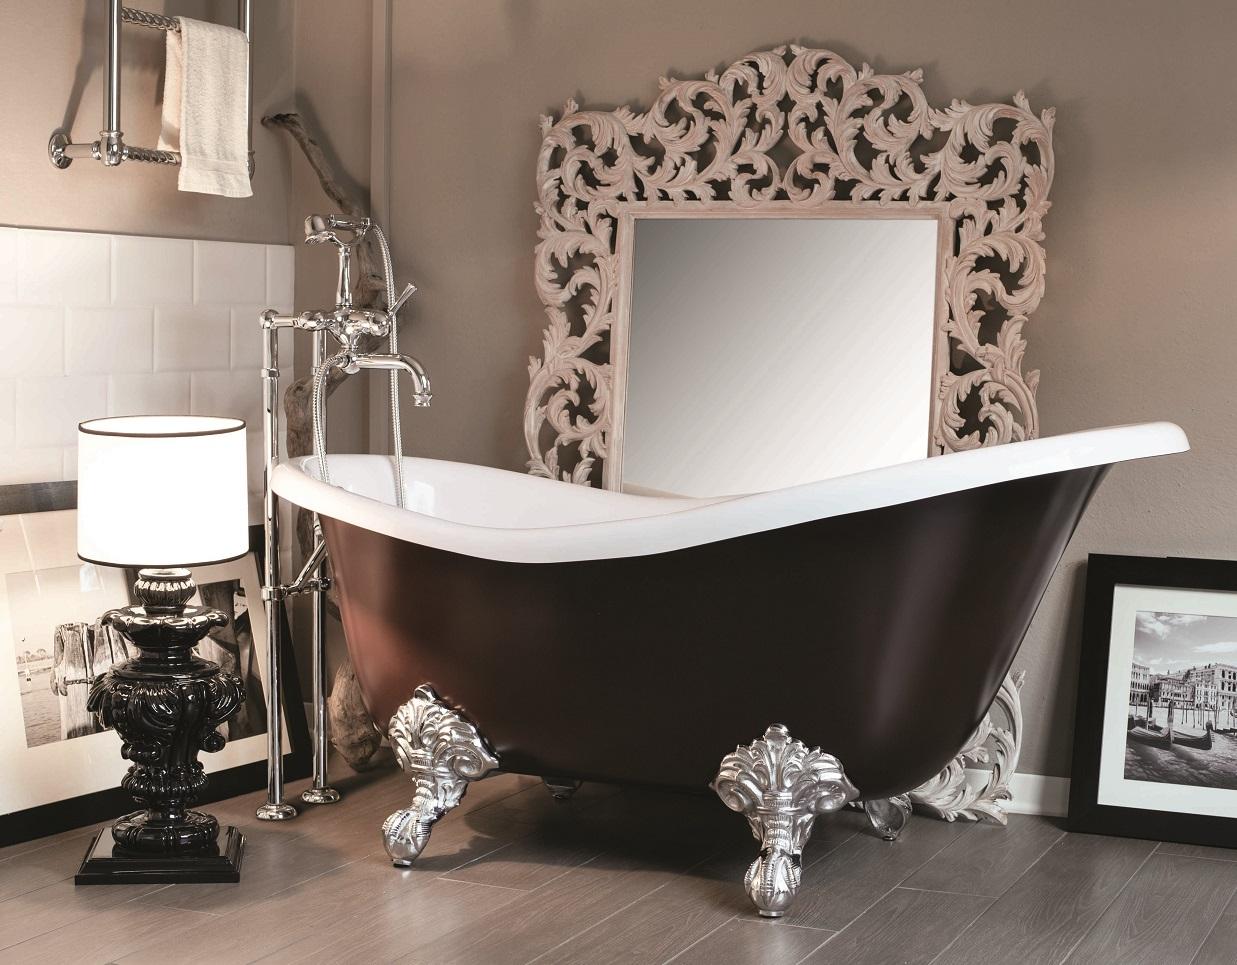 Gaia mobili - complementi - vasche - Margot - Vasca in marmoresina